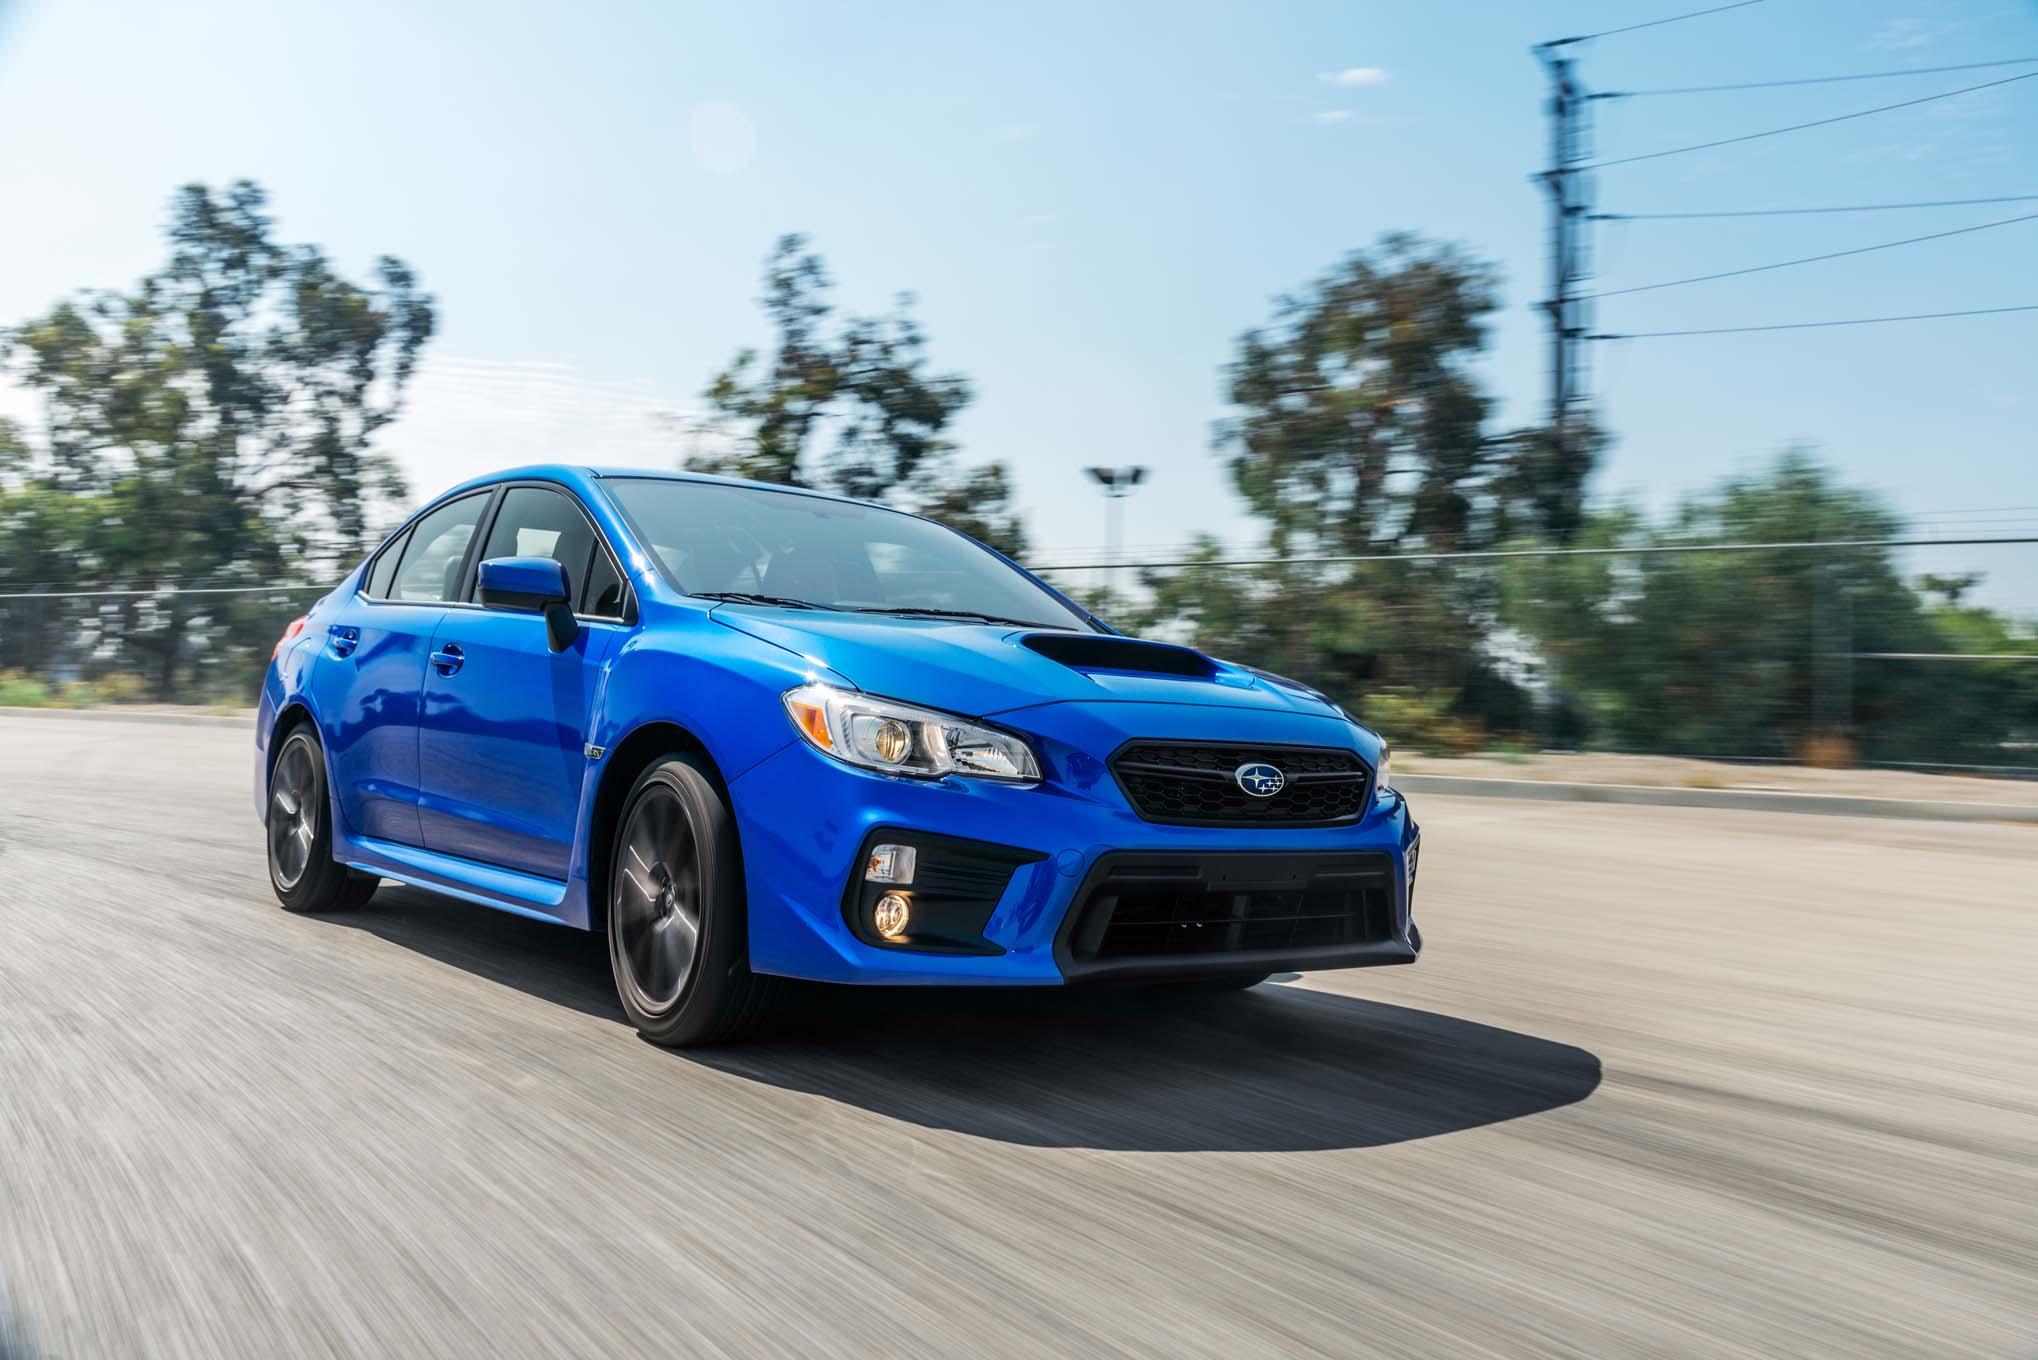 2018 Subaru WRX Front Three Quarter In Motion 02